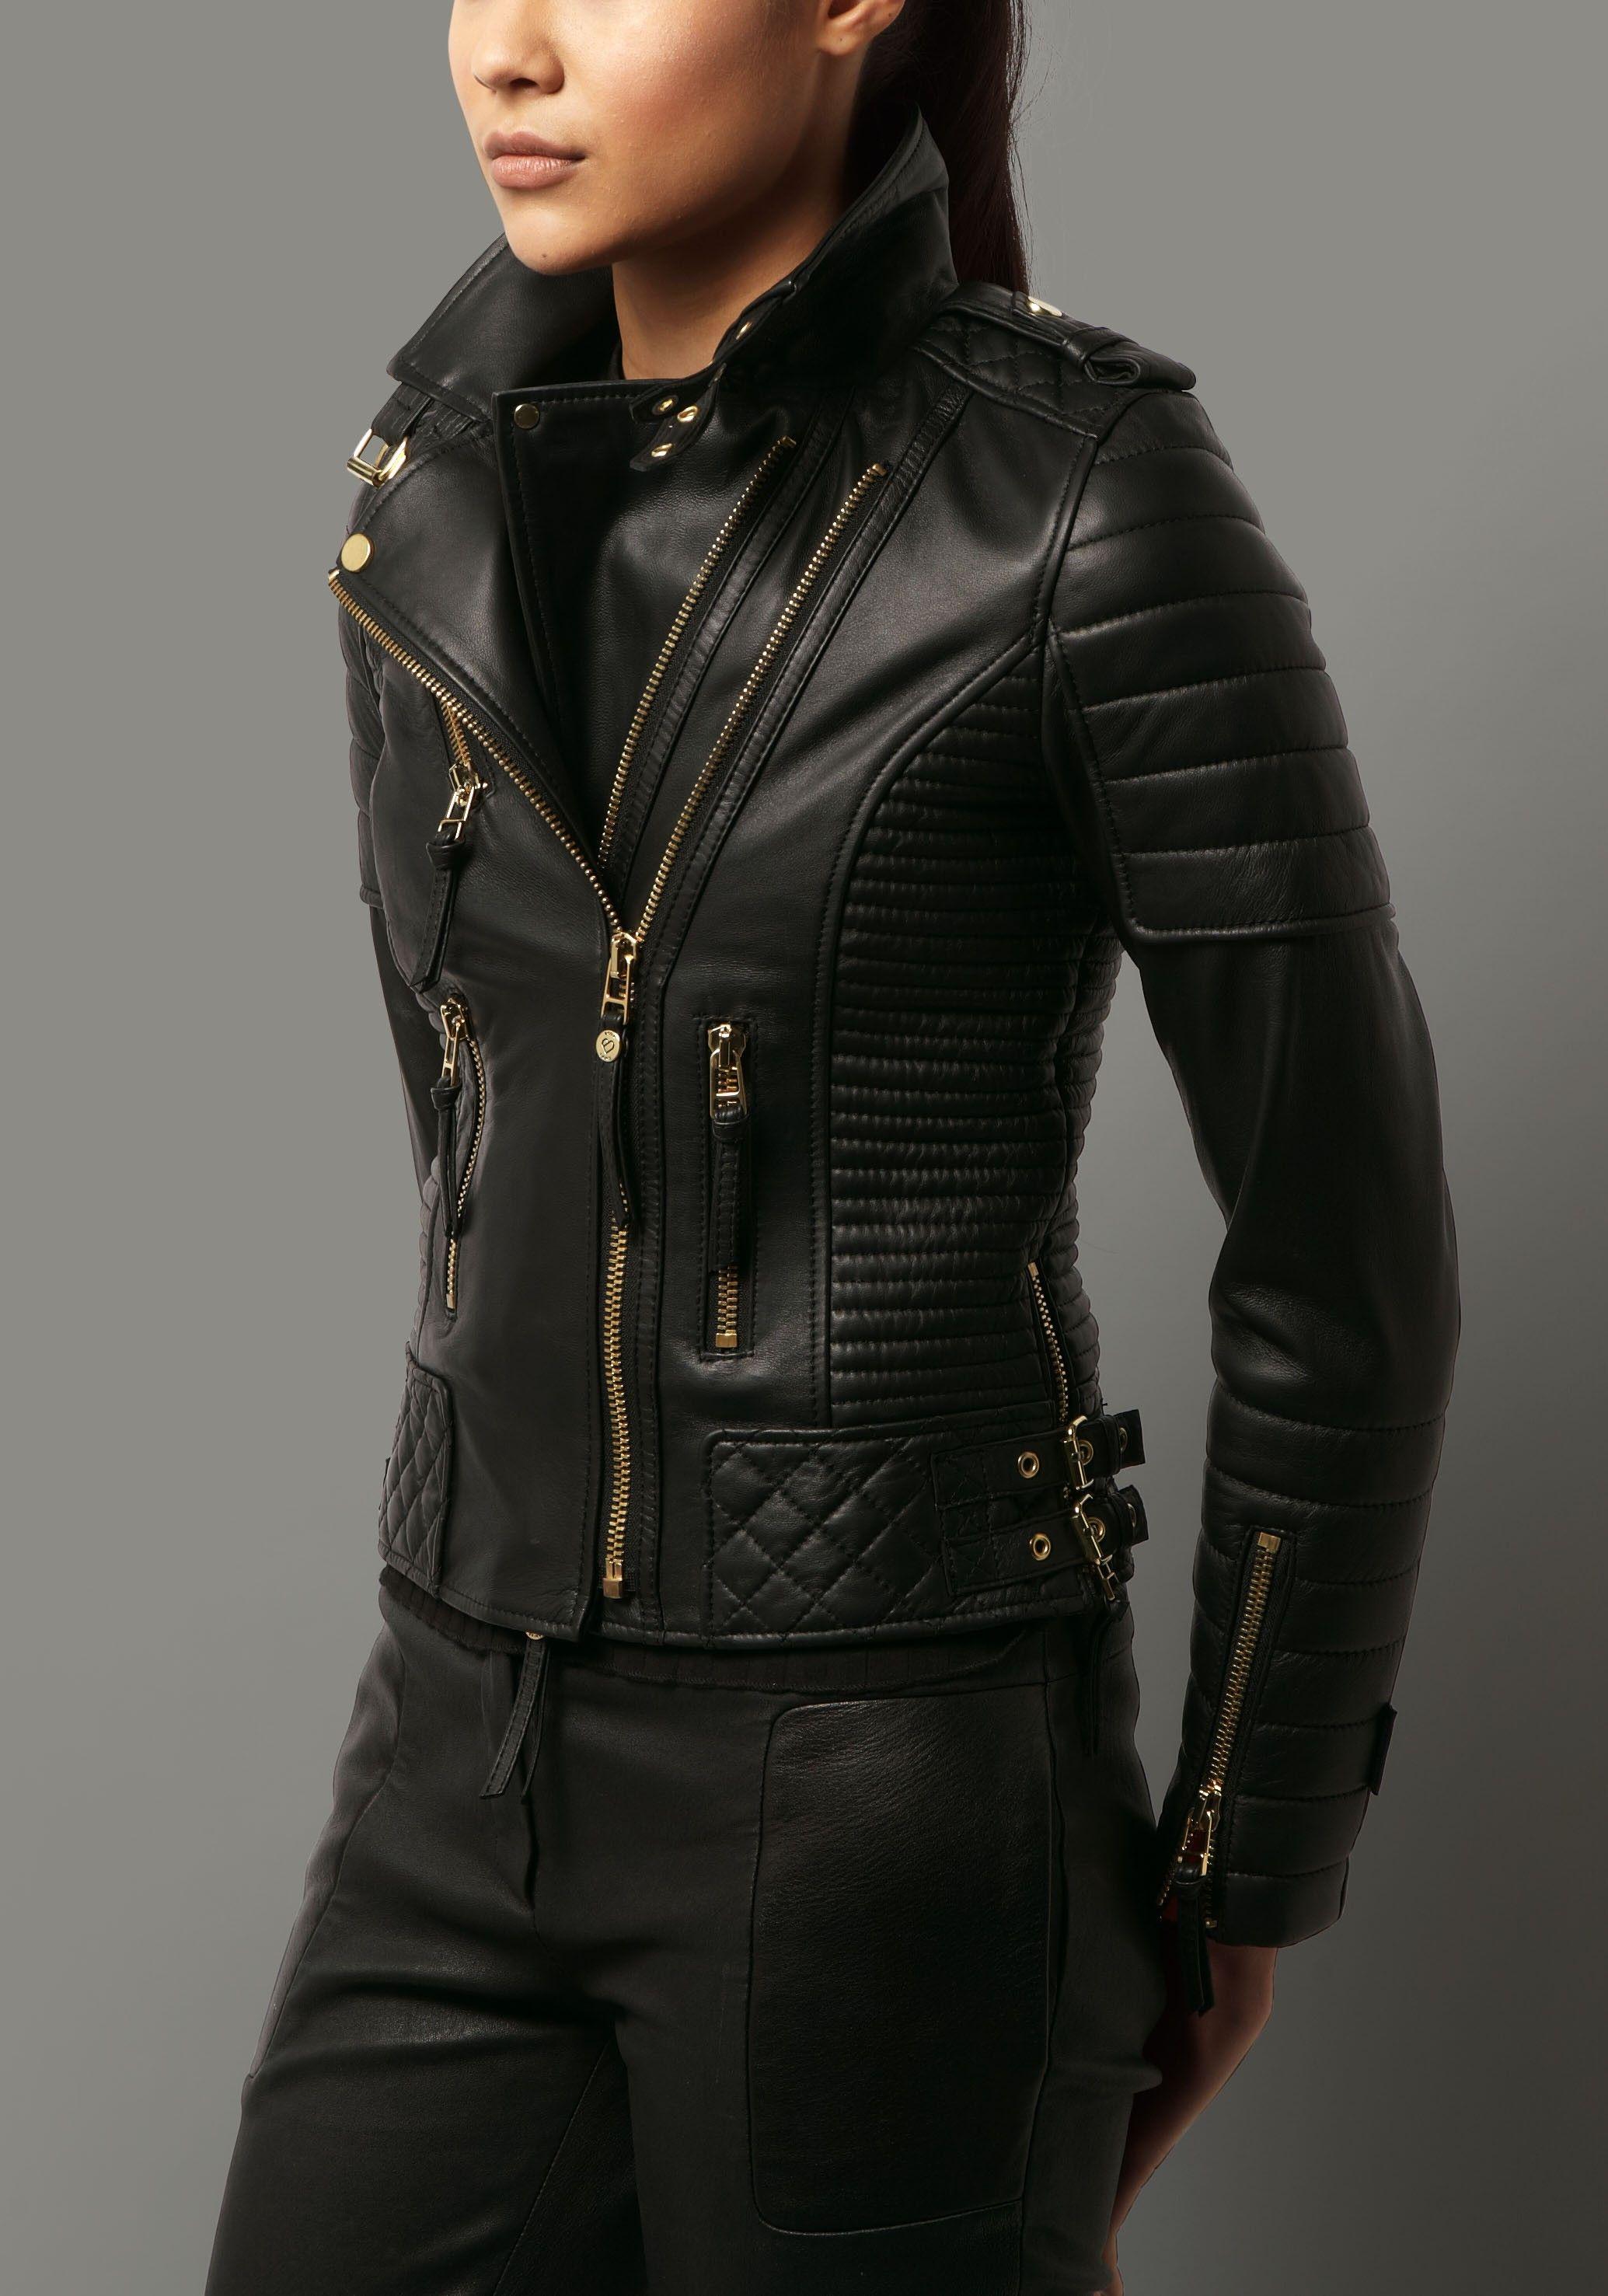 5541edcd09e Kay Michaels Quilted Biker V.2 (Gold Hardware) Lambskin Leather Jacket